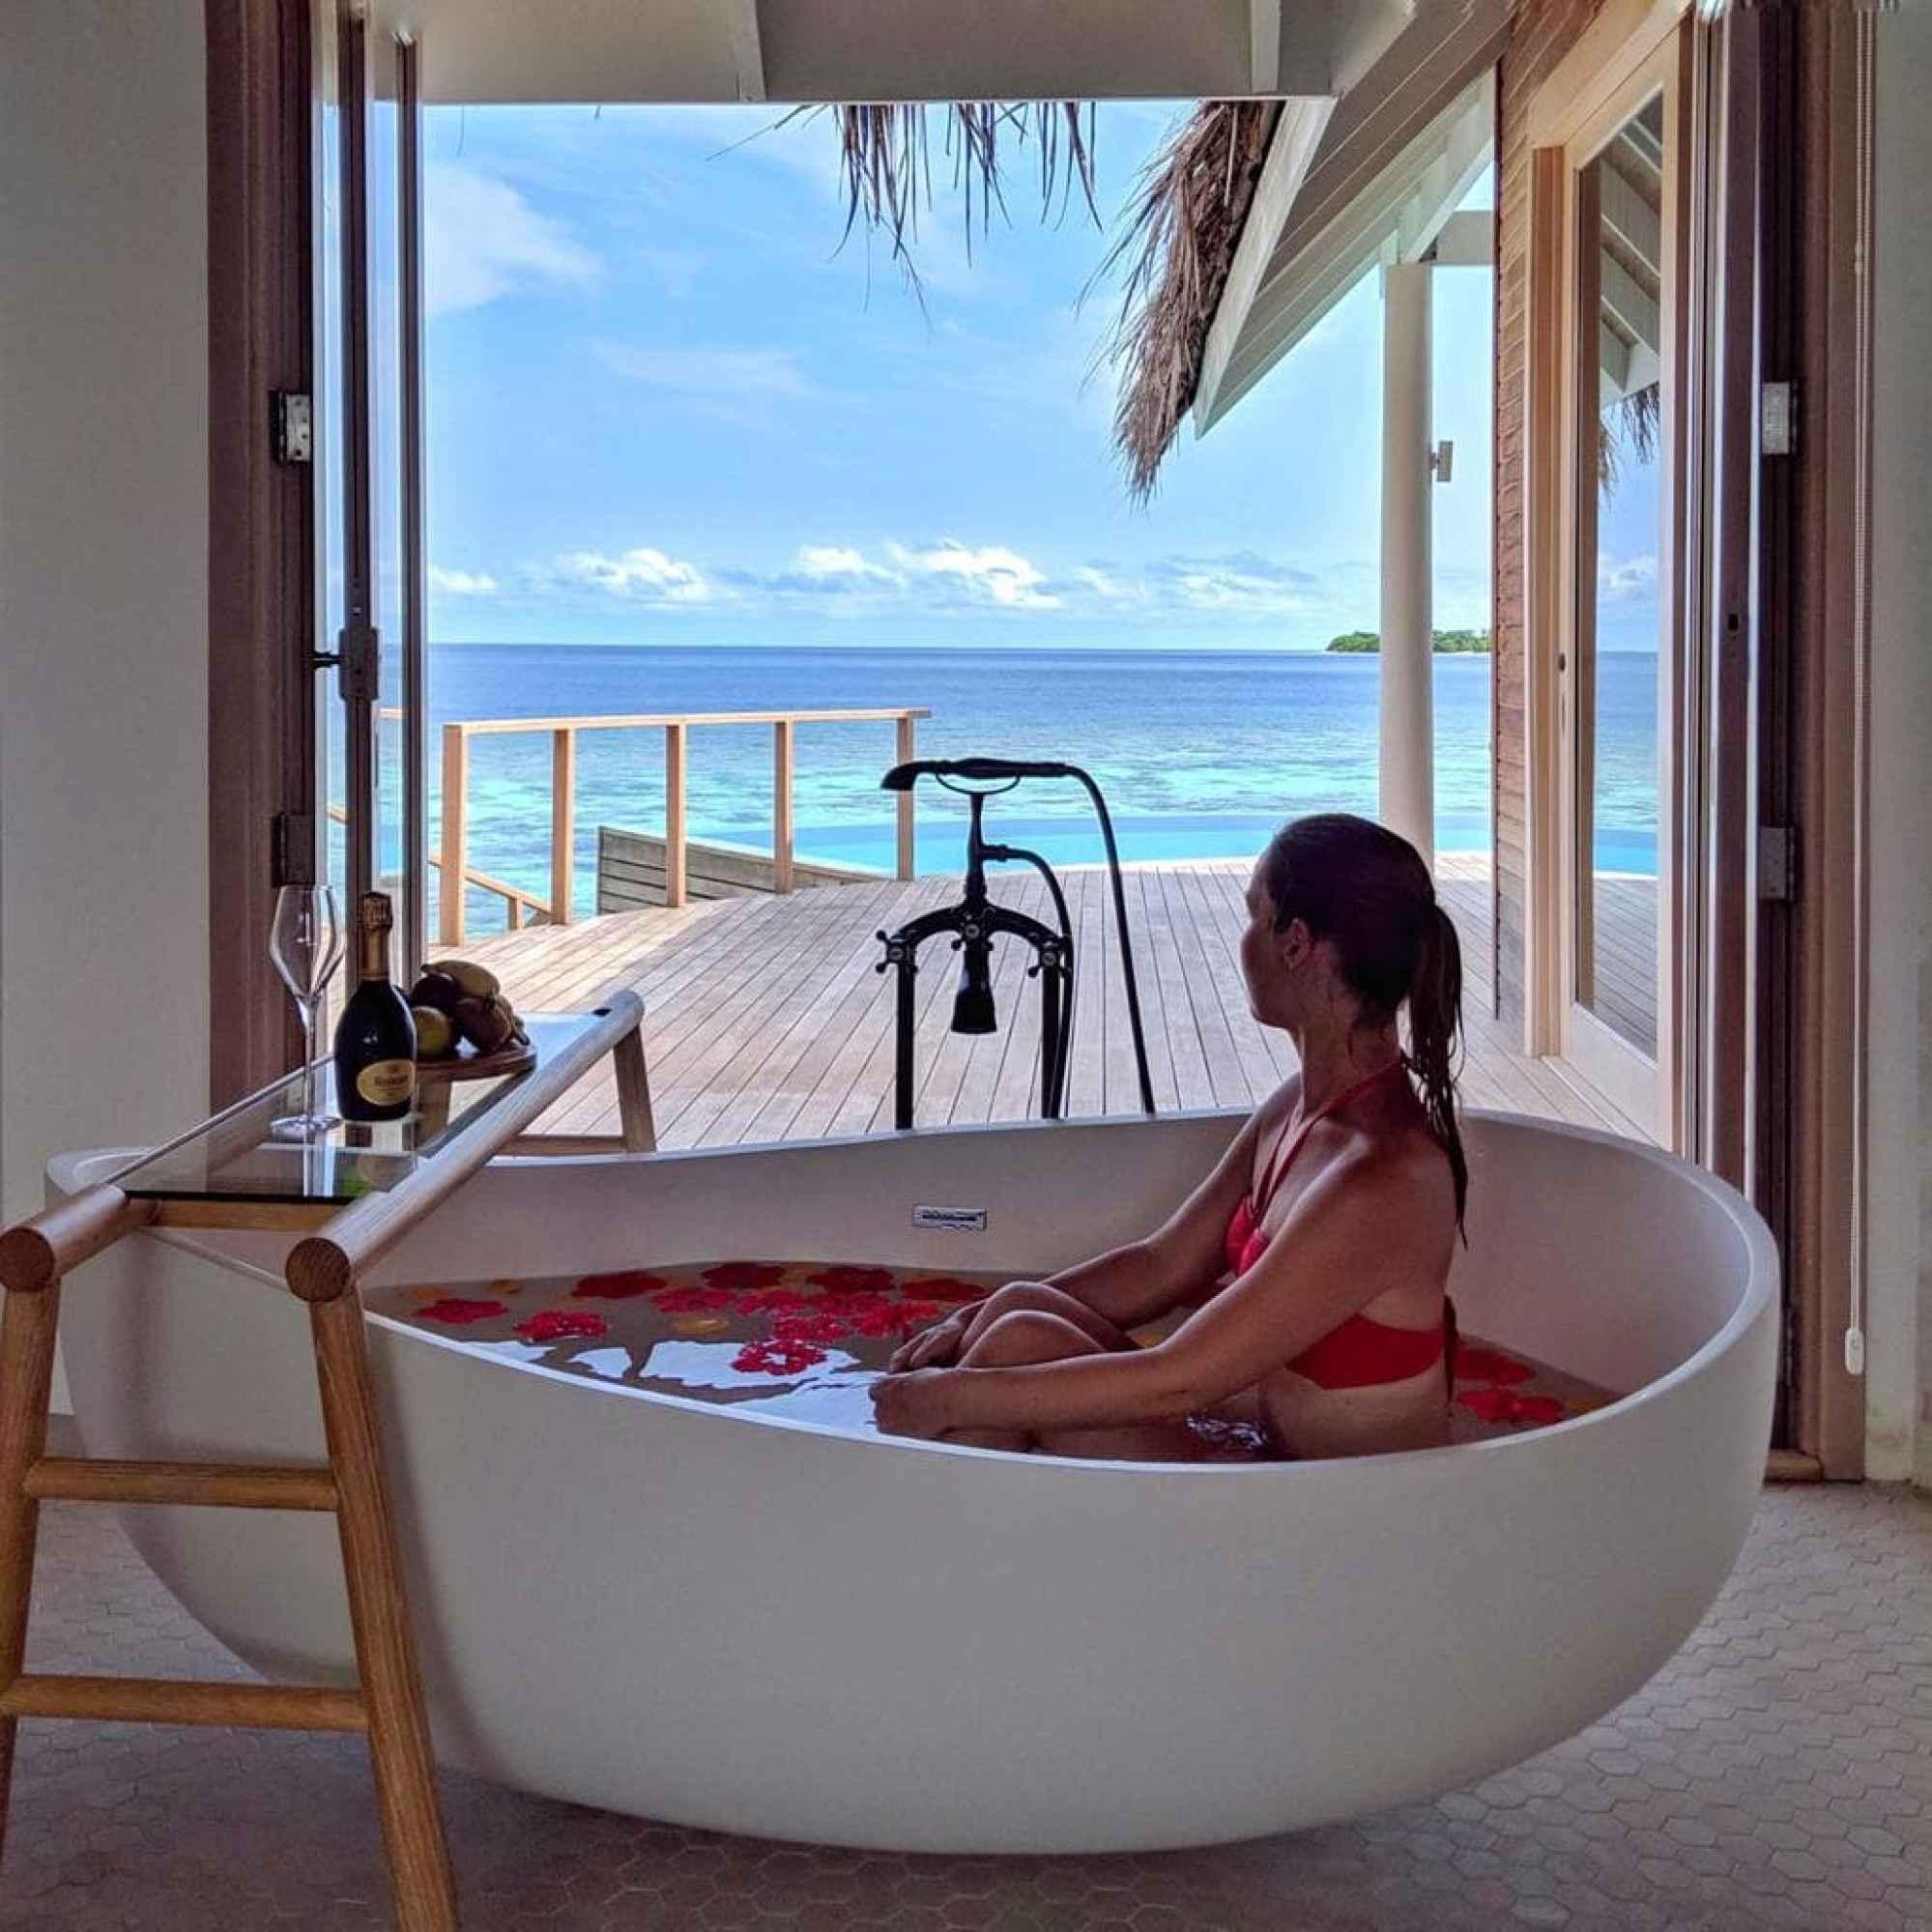 Bathtub views from the water villa at Milaidhoo